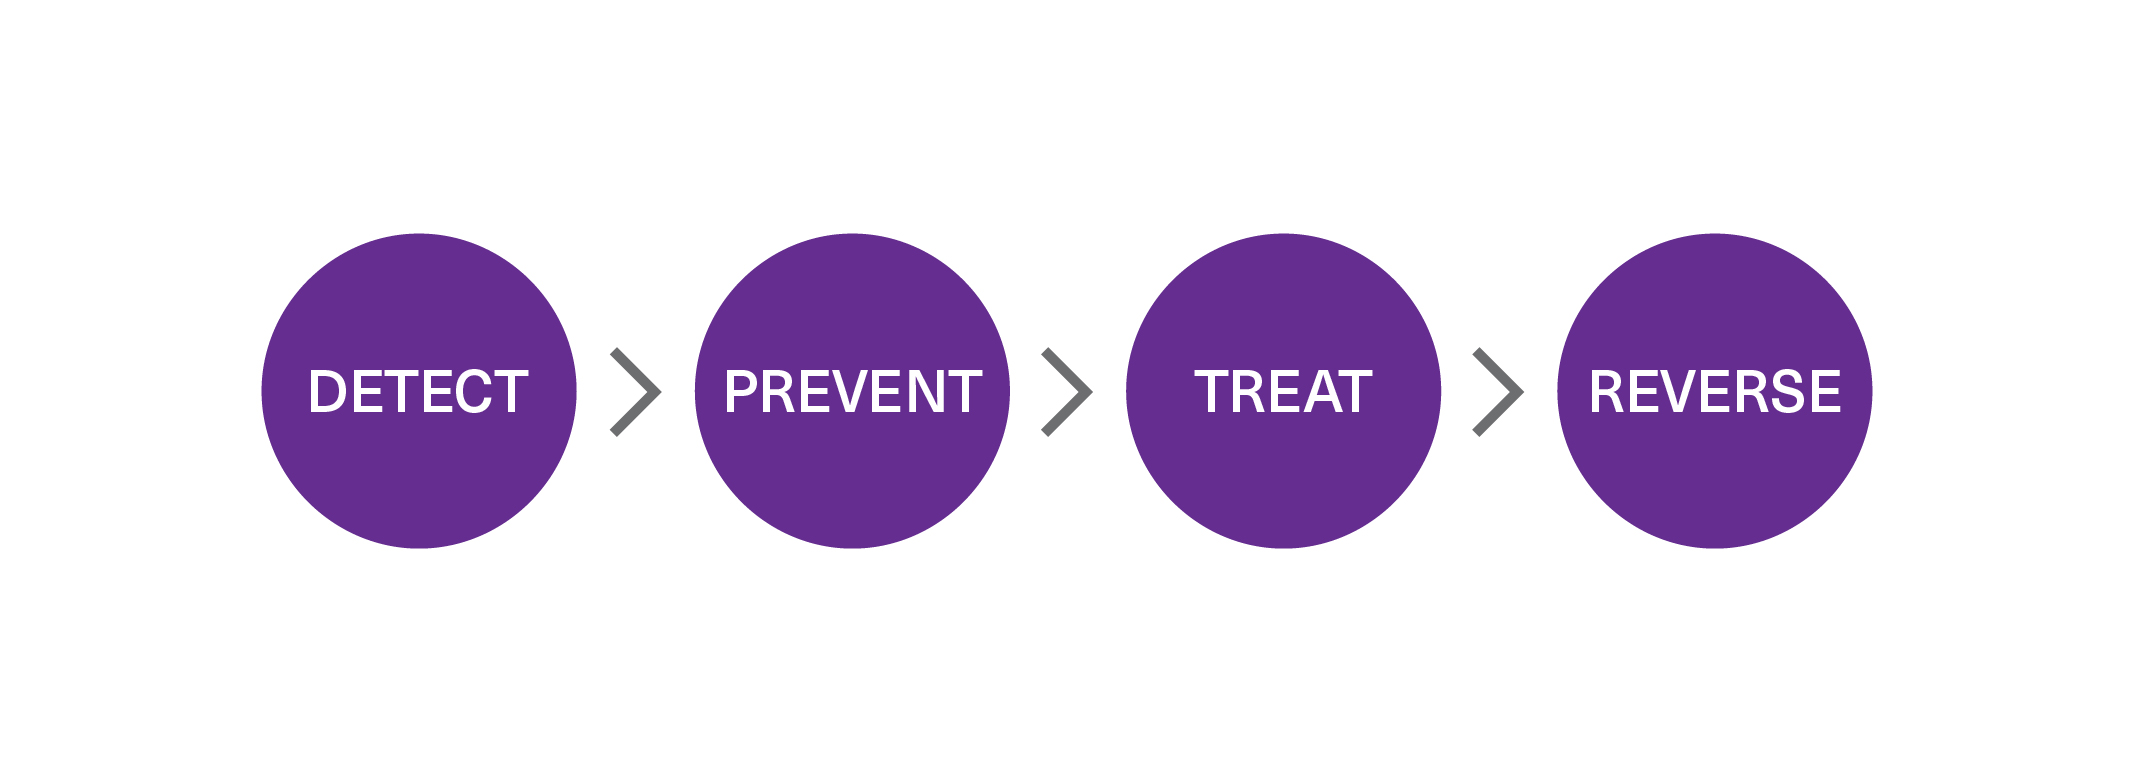 Detect-Prevent-Treat-Reverse